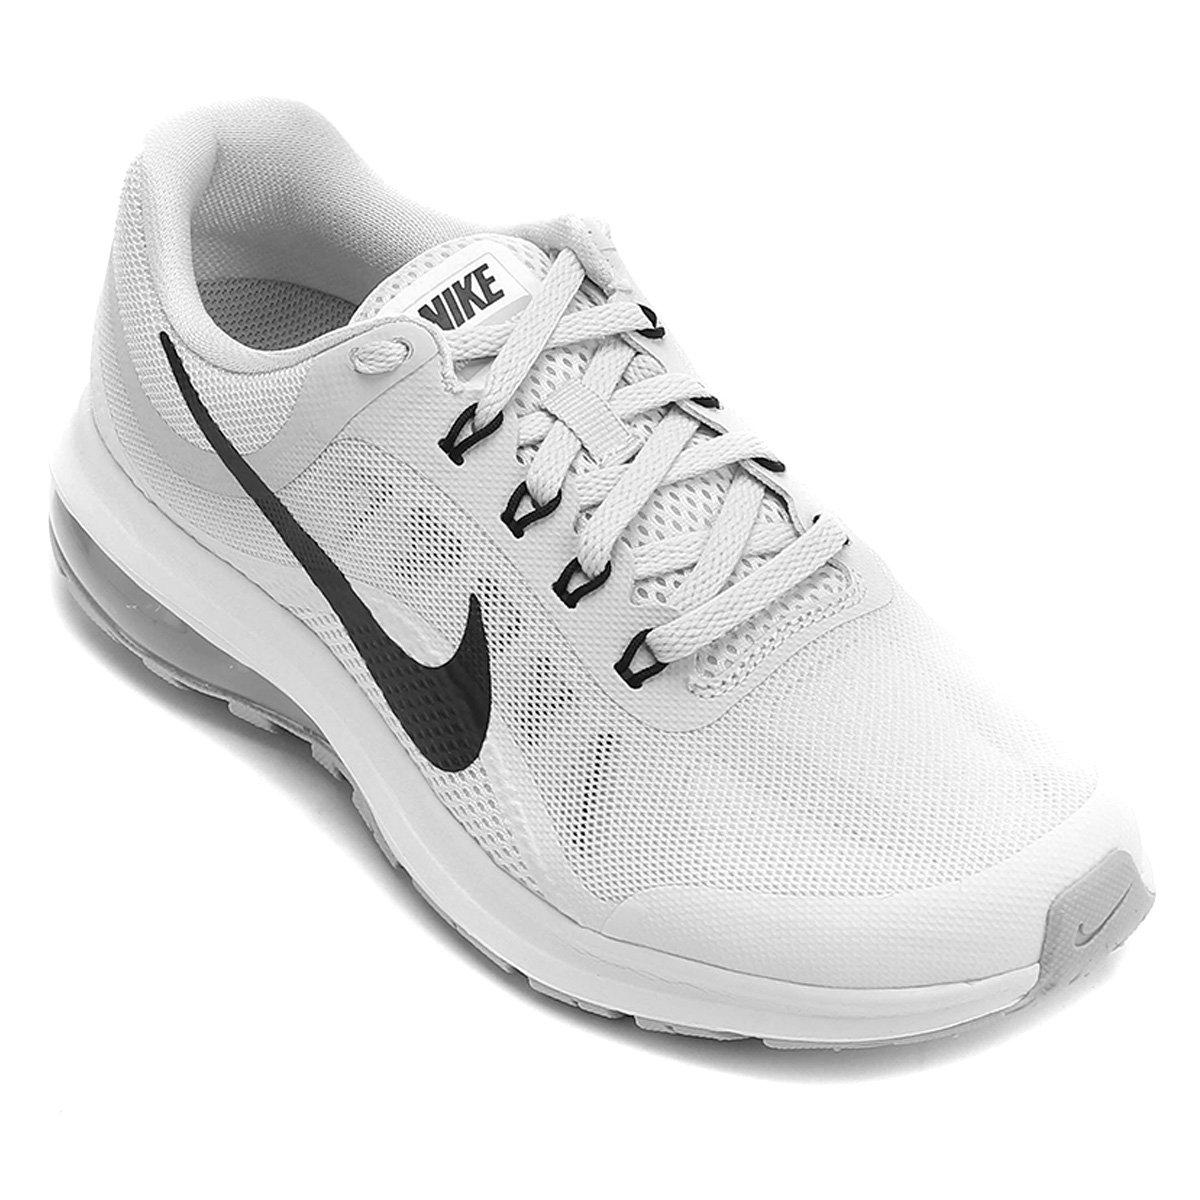 9aa347f3369 Tênis Nike Air Max Dynasty 2 Feminino - Branco e Preto - Compre Agora